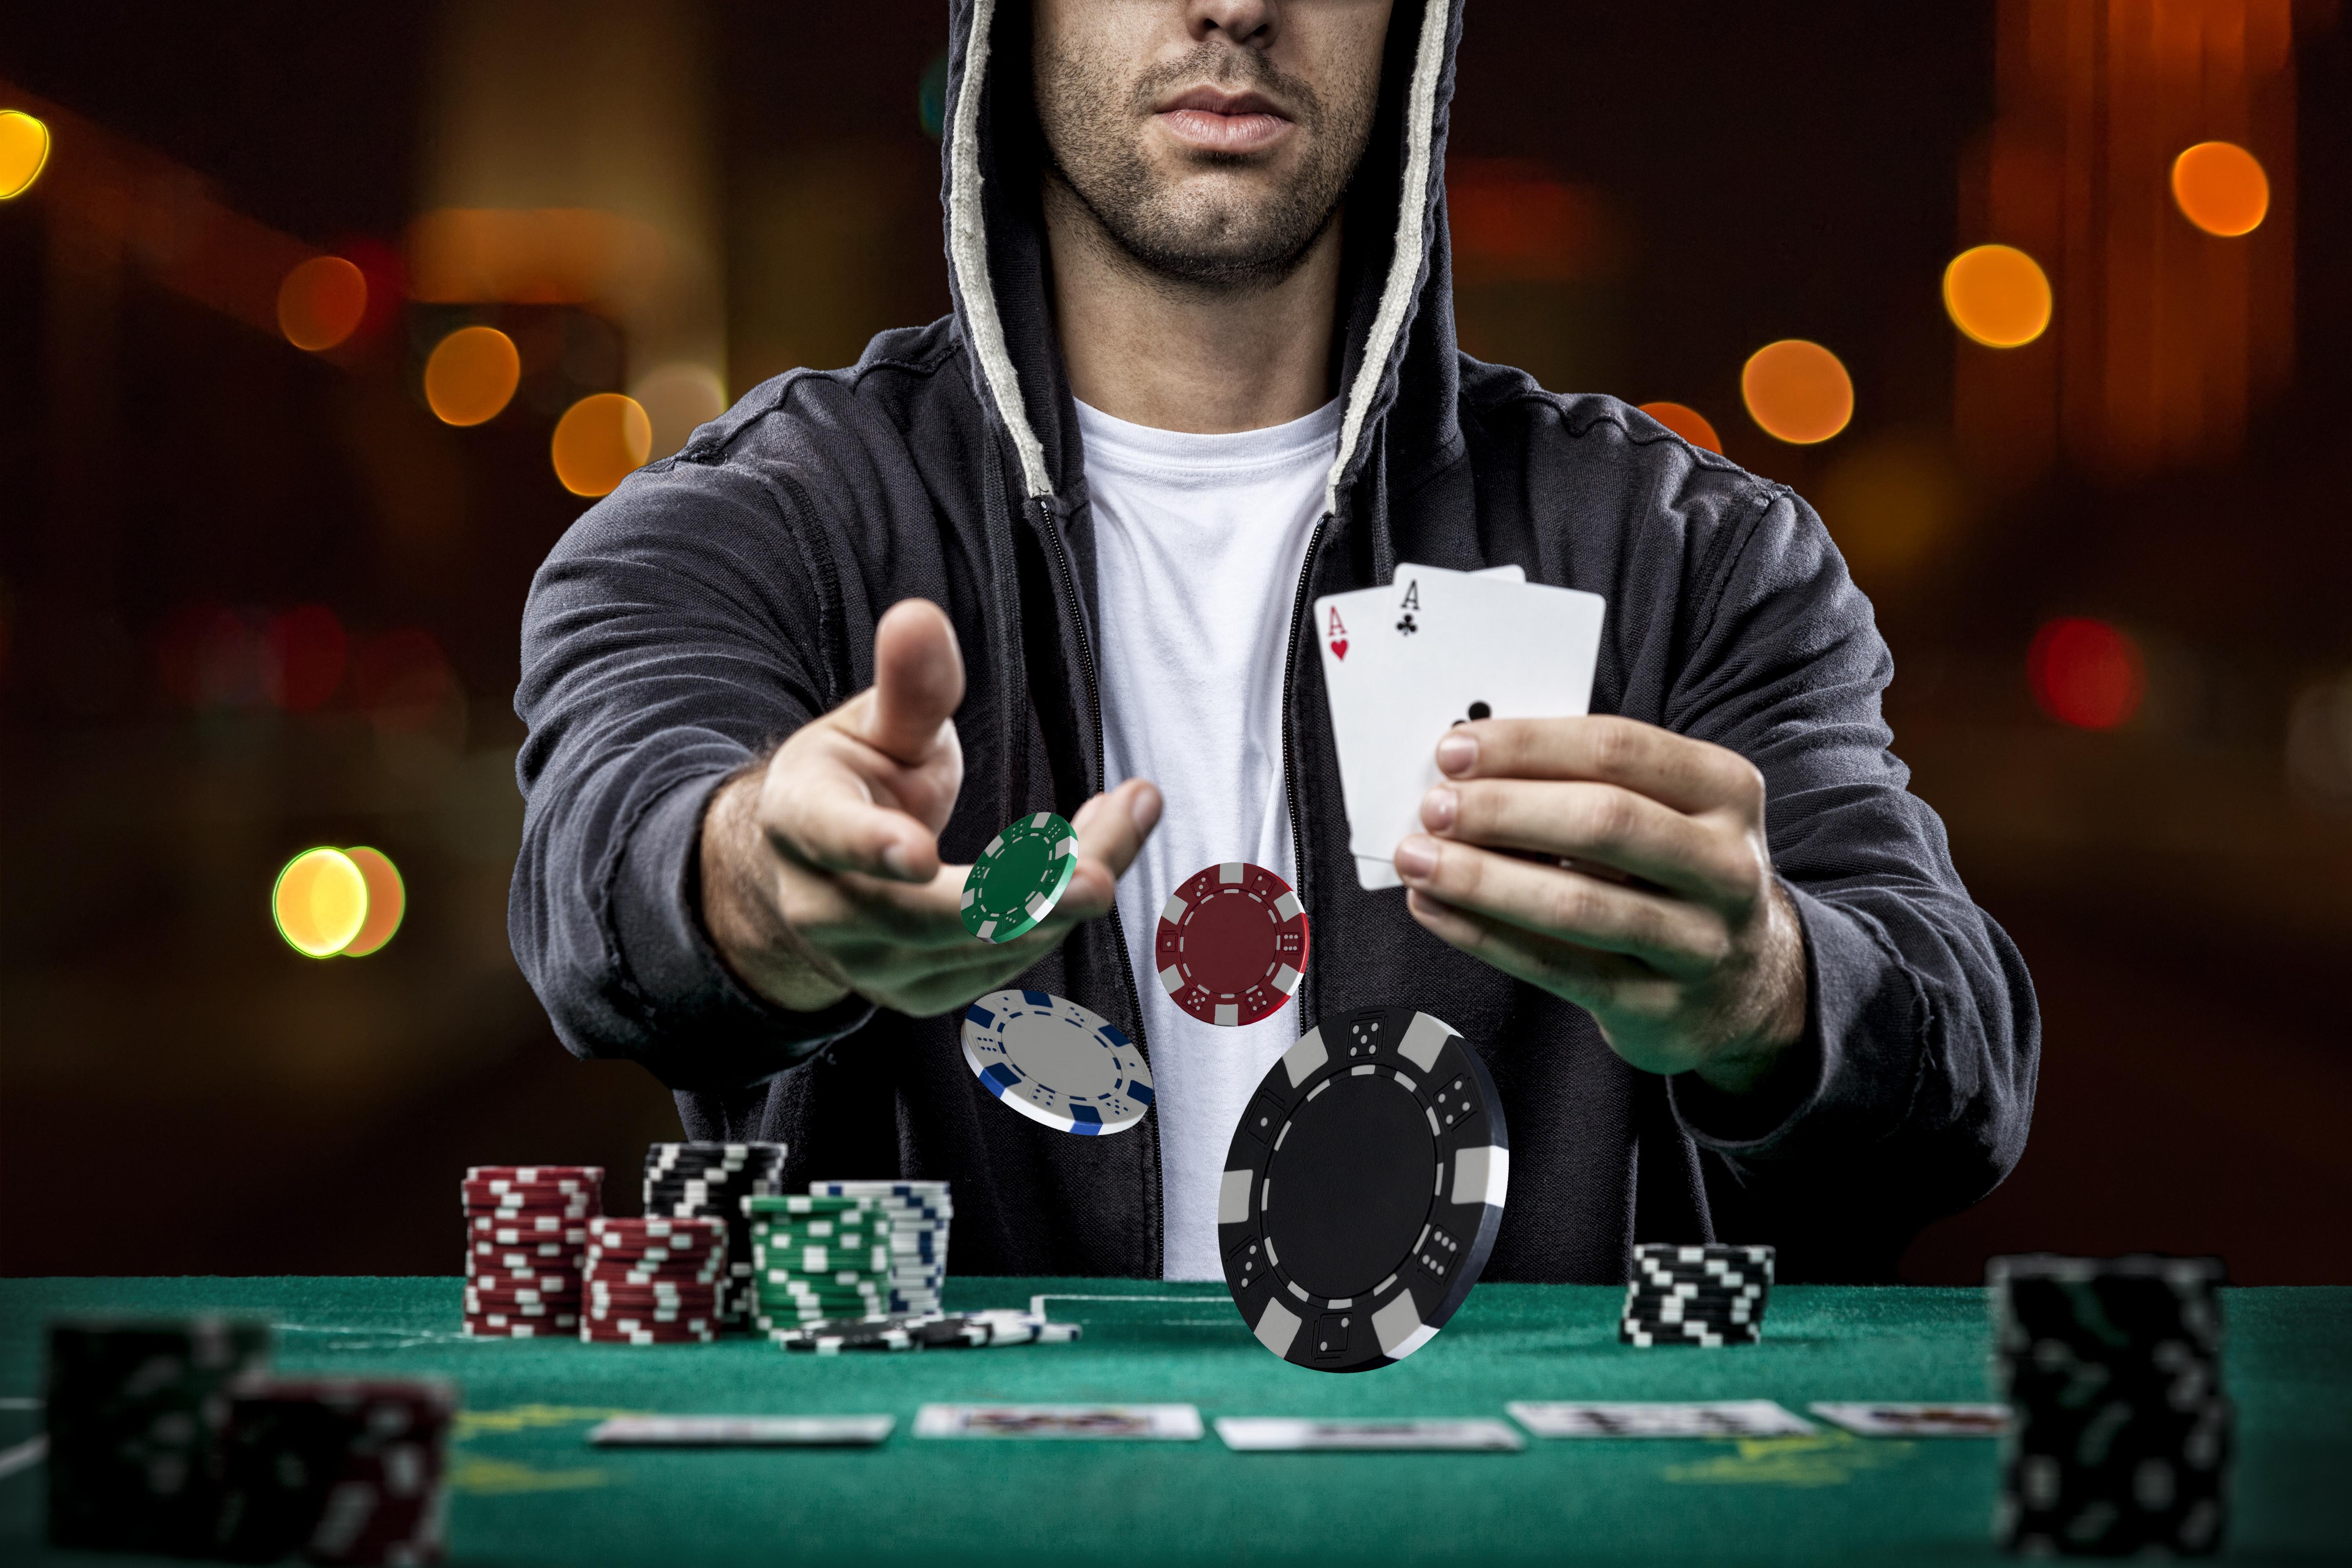 Straight girls black guys play poker for blonde girl handcuffs free